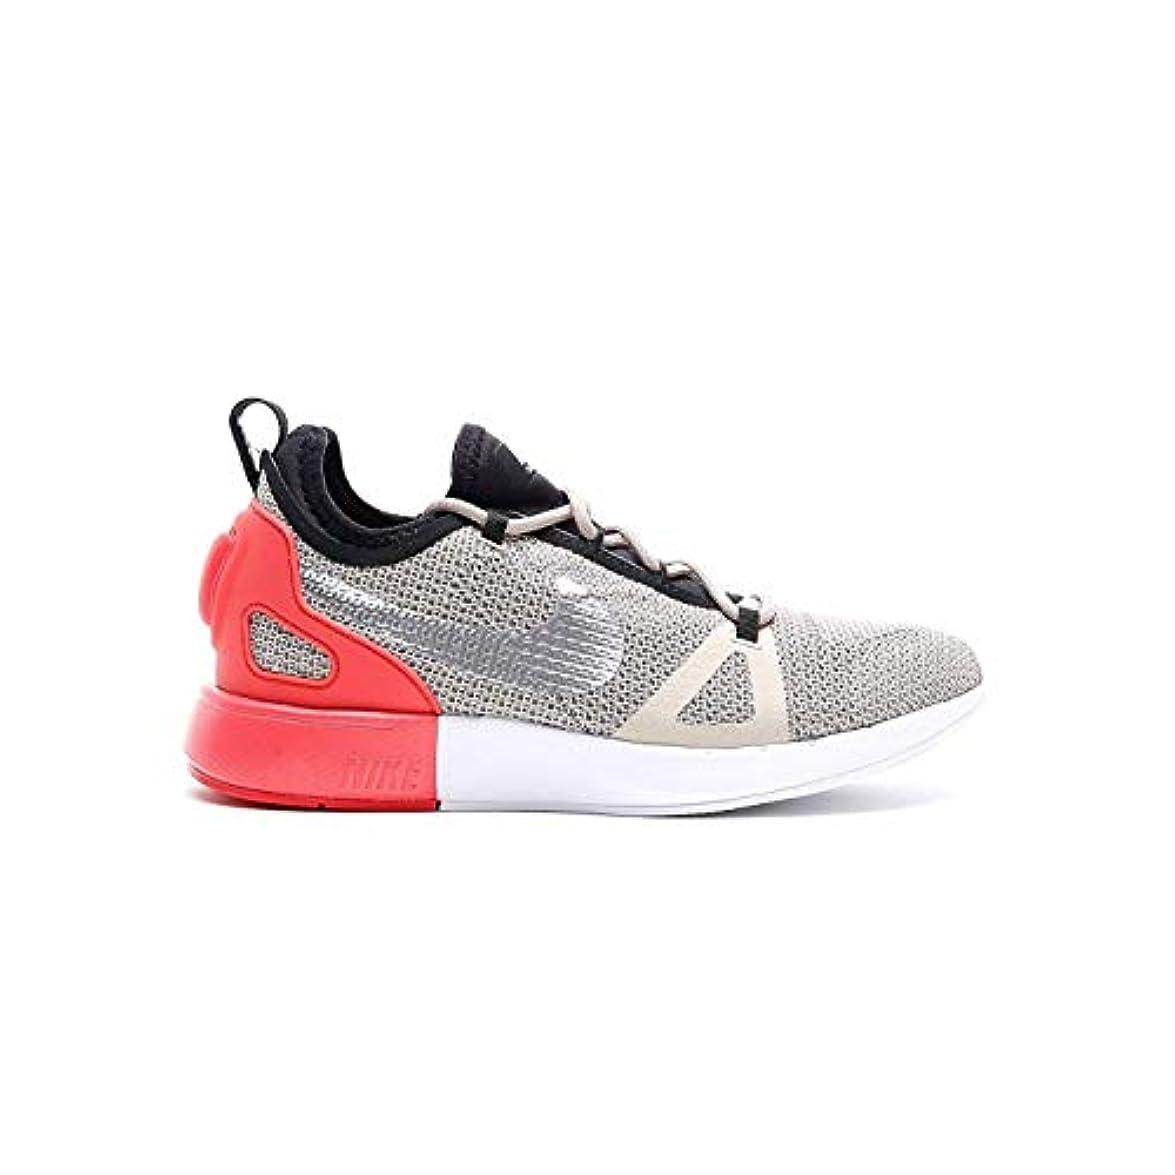 Nike Duel Racer Uomo Sportivo Bianco 918228 102